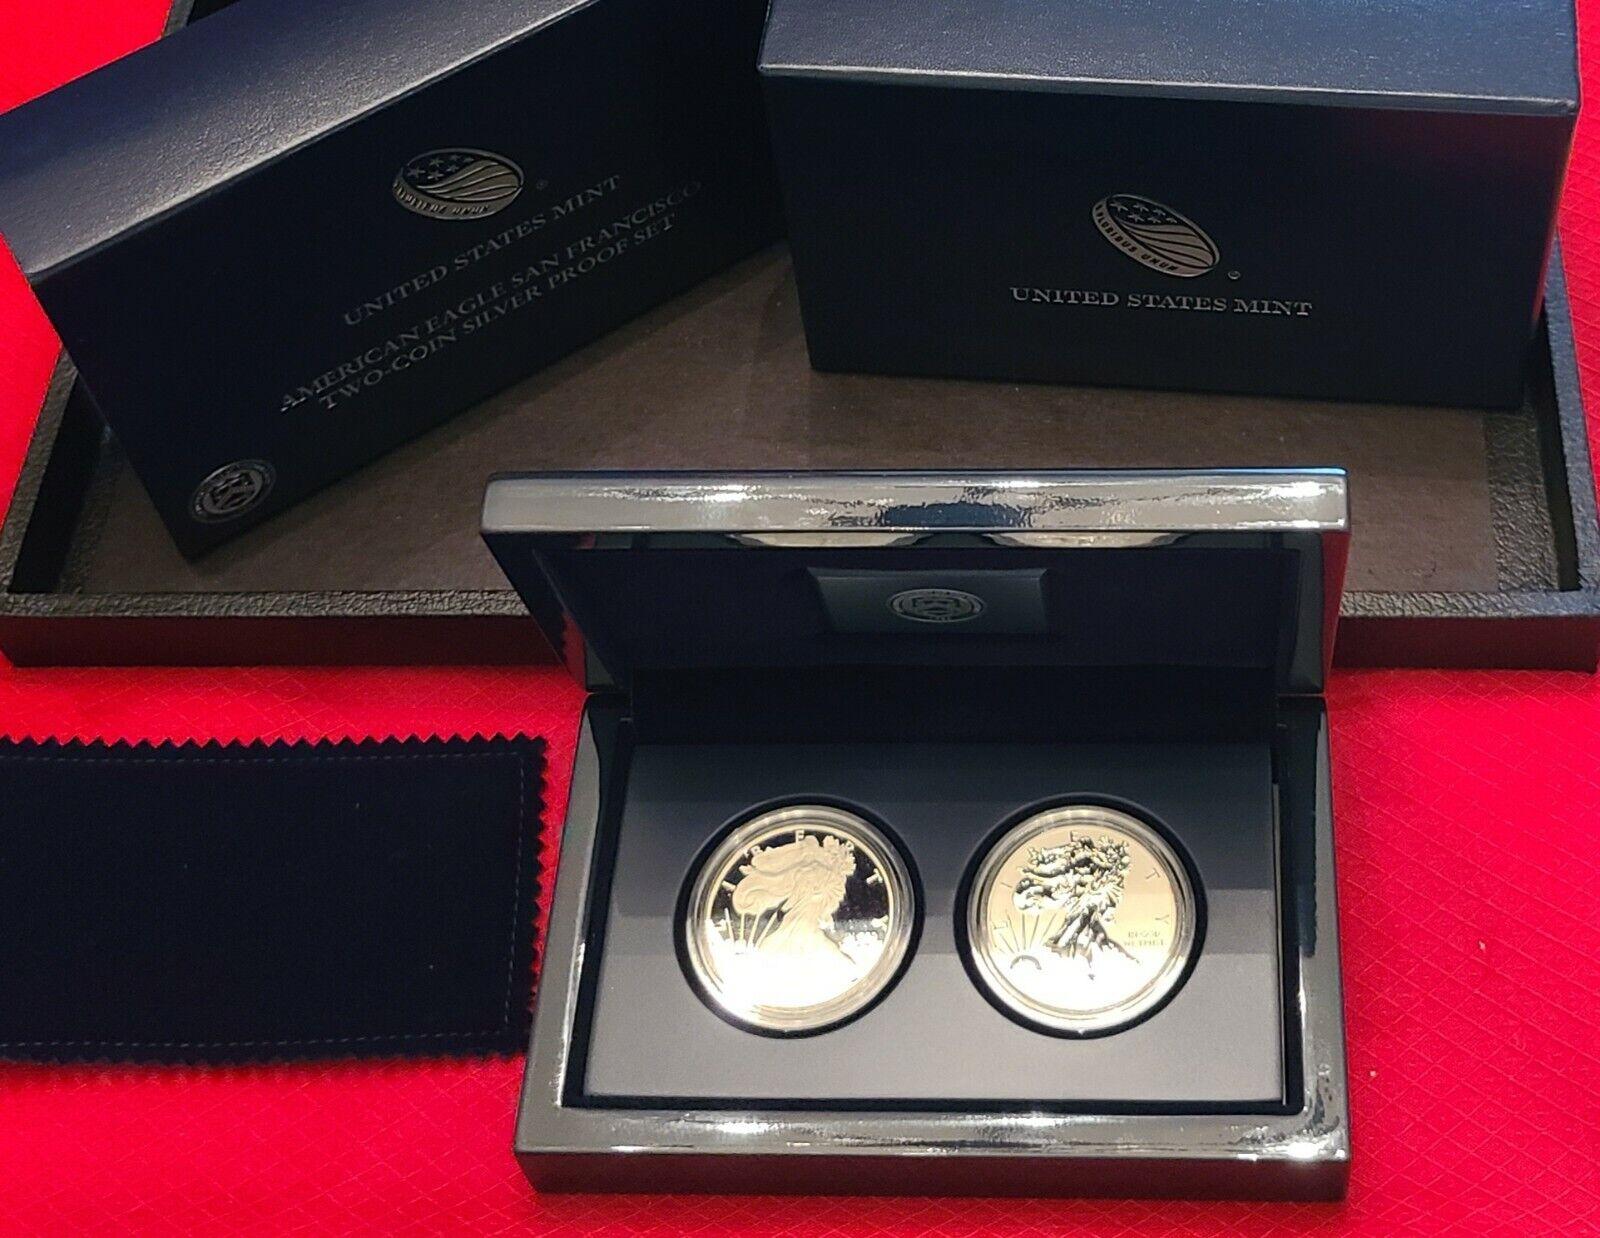 2012-S American Silver Eagle San Francisco Mint 2 Coin Set  - $162.50